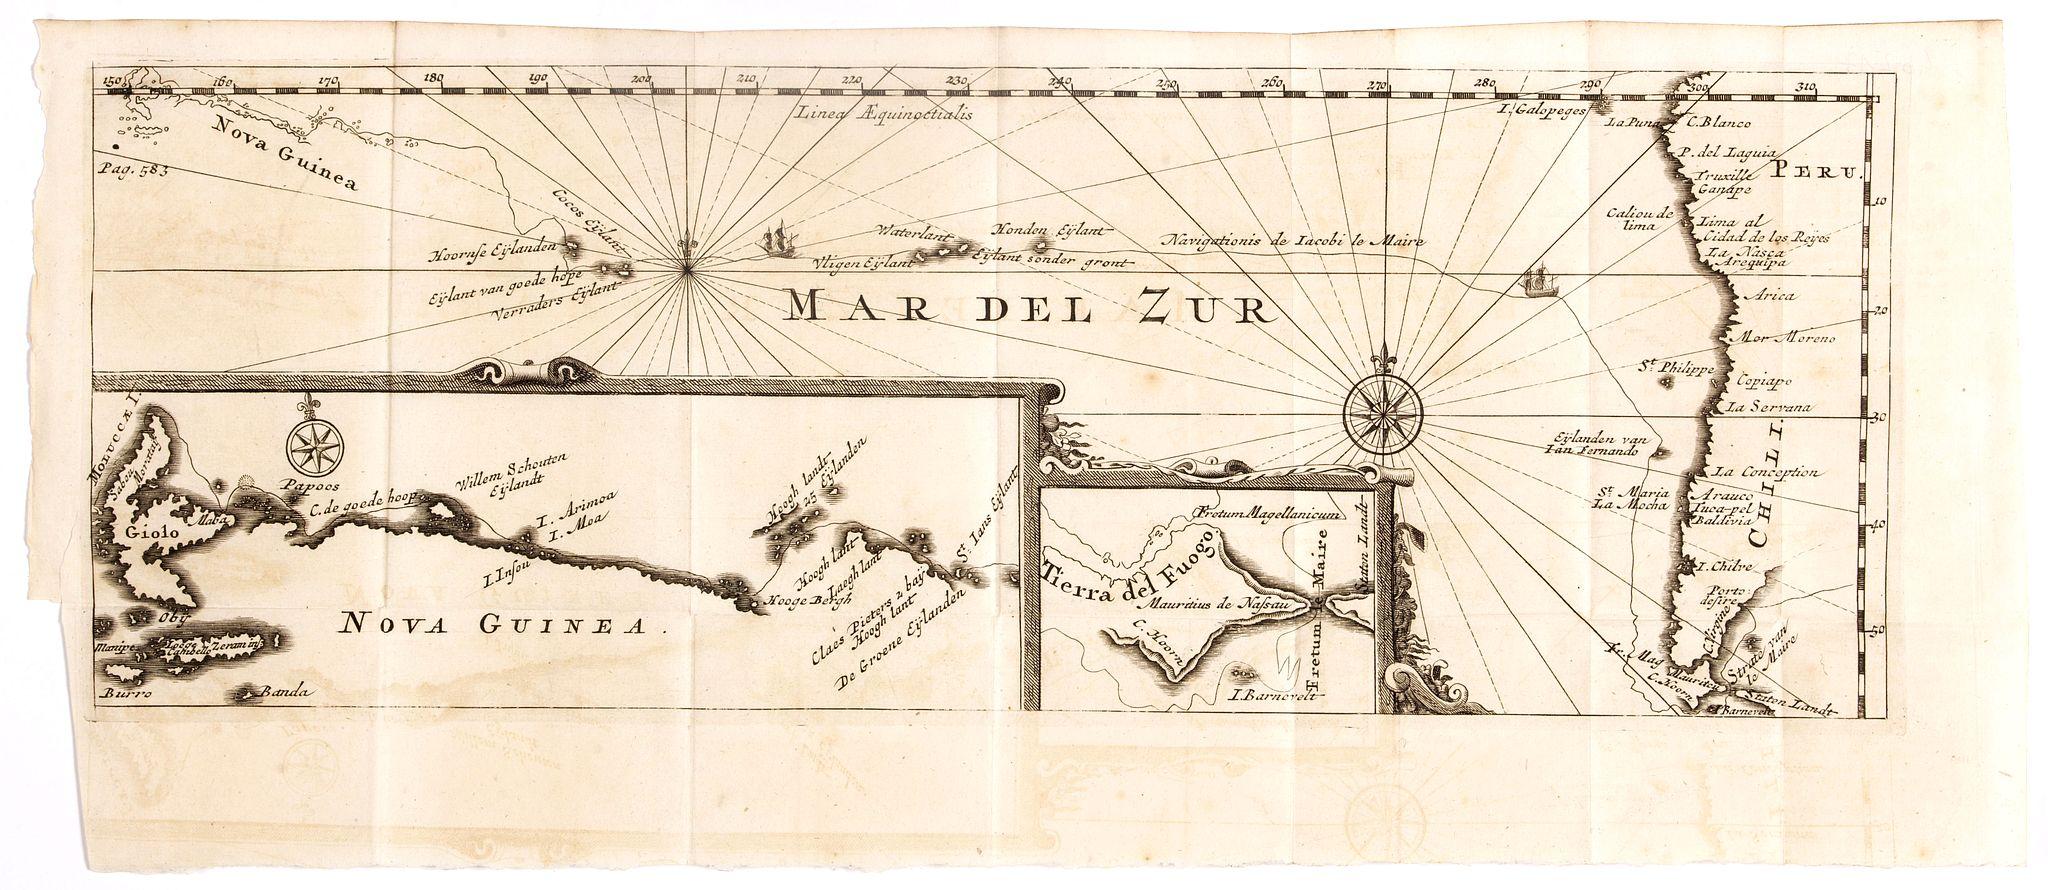 DE RENNEVILLE, R.A.C. - Mar del Zur / Nova Guinea / Terra del Fuogo.